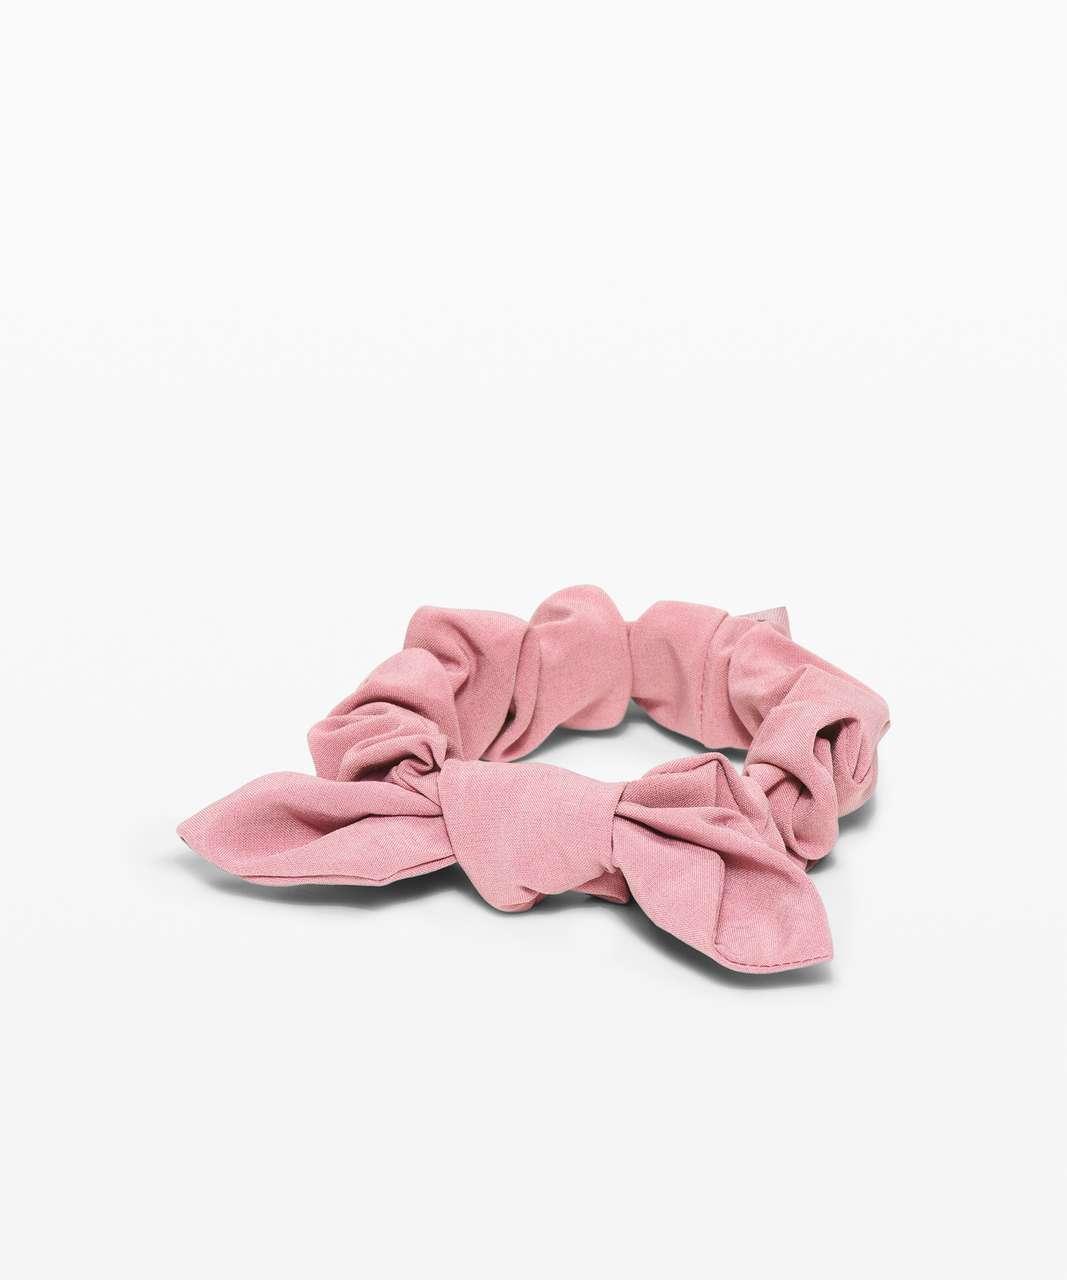 Lululemon Uplifting Scrunchie *Bow - Pink Taupe